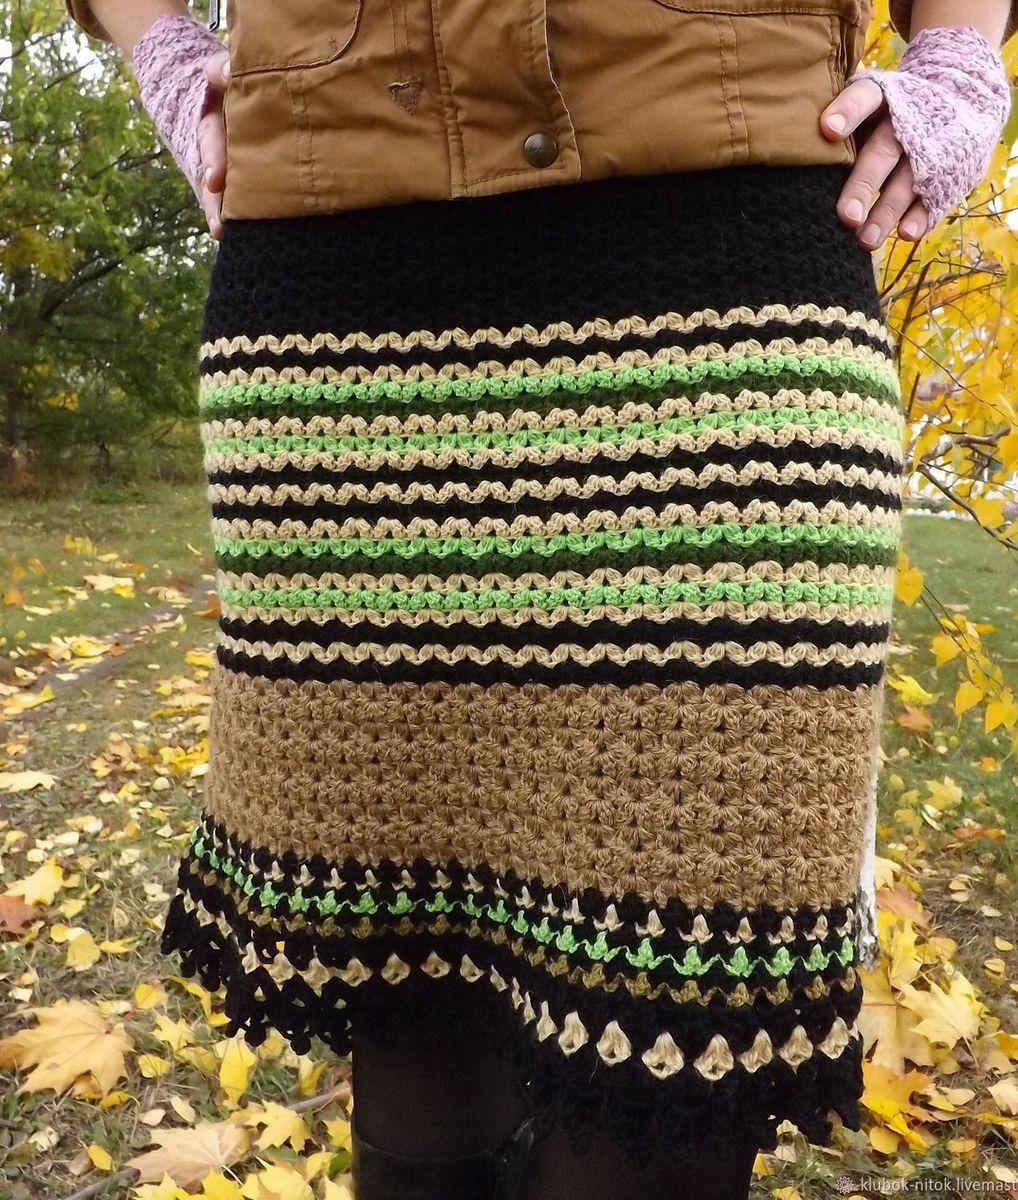 d8218f6c819 Вязаная шерстяная юбка. Юбка вязаная в полоску. Юбка зелено-черная.Юбка  крючок